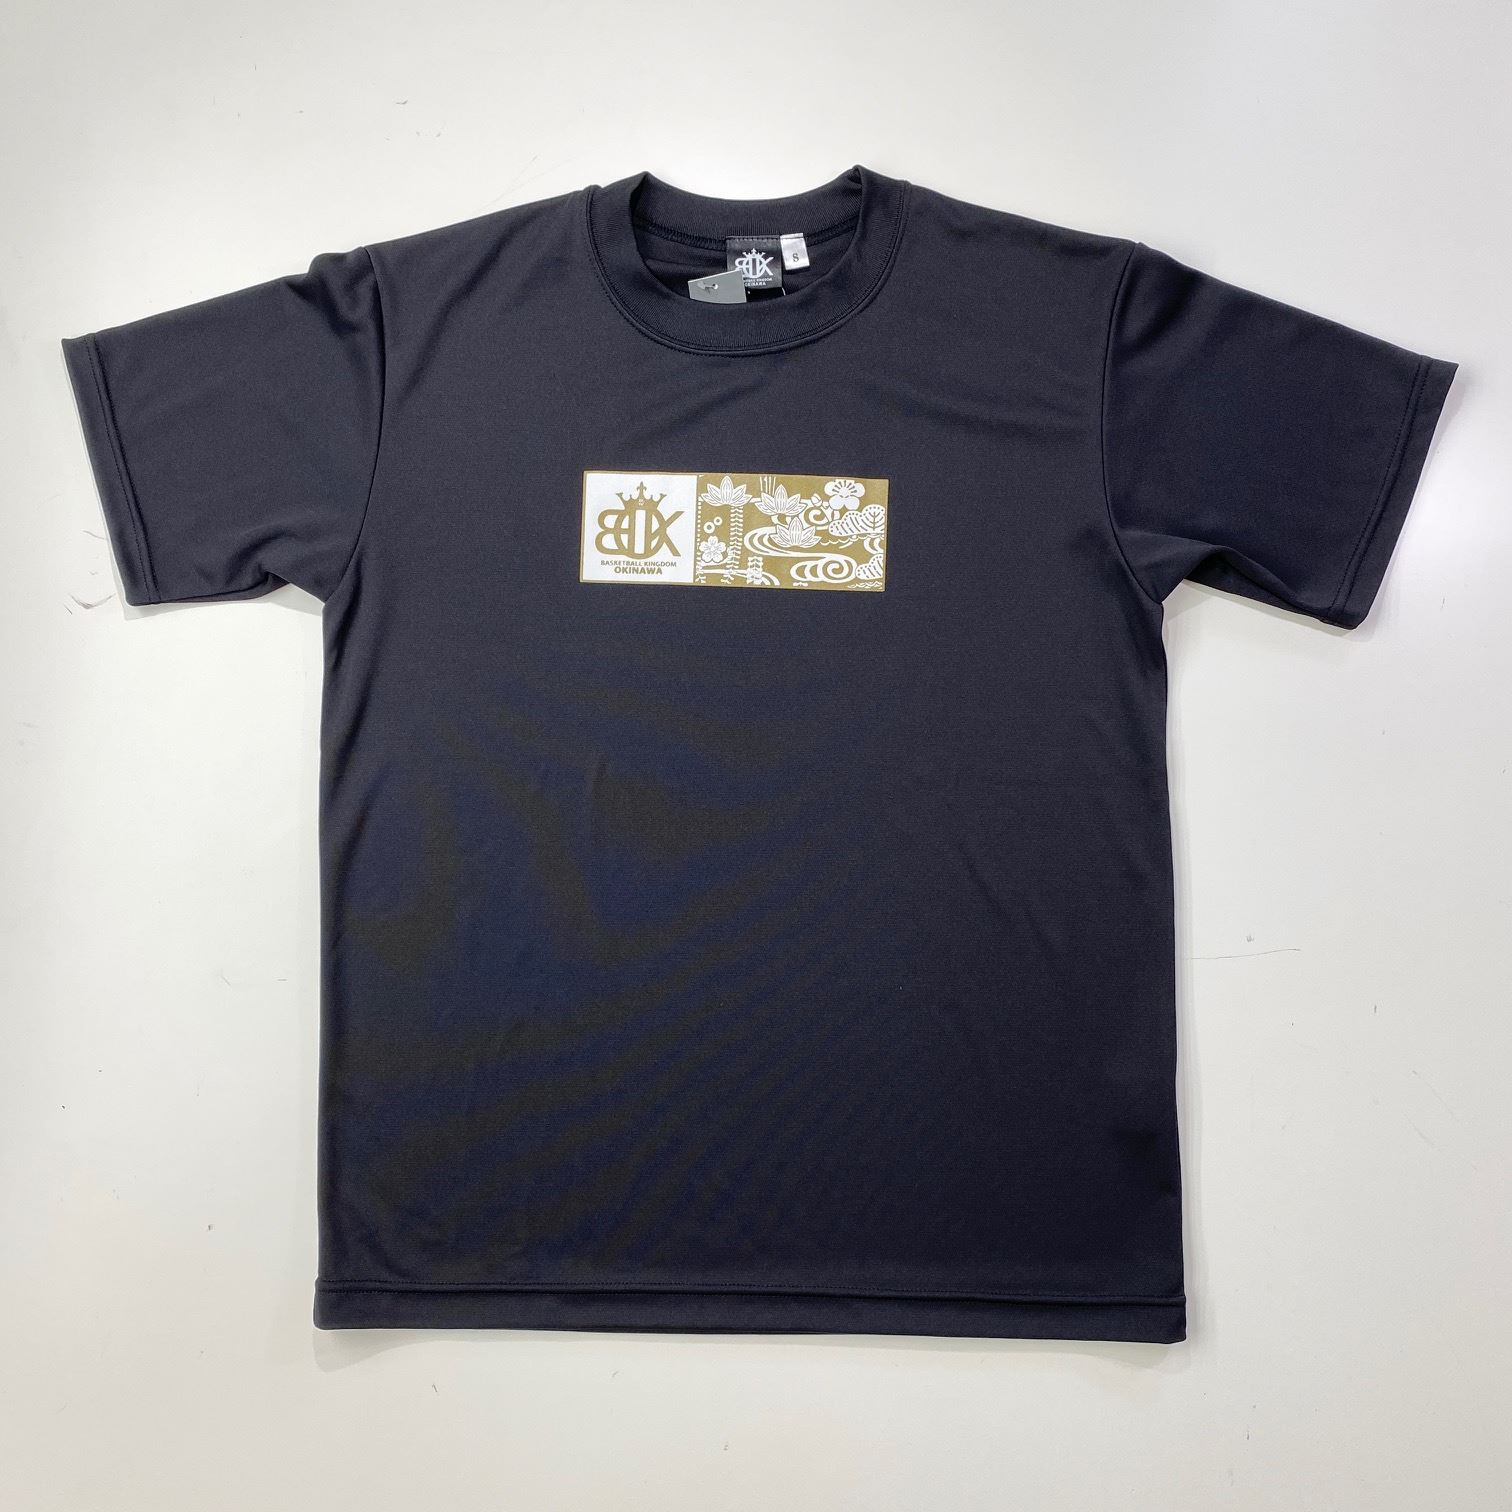 OBKT-2004 / OKINAWA BASKETBALL KINGDOM / Tシャツ / オキナワバスケットボールキングダム / Tシャツ/ オリジナル